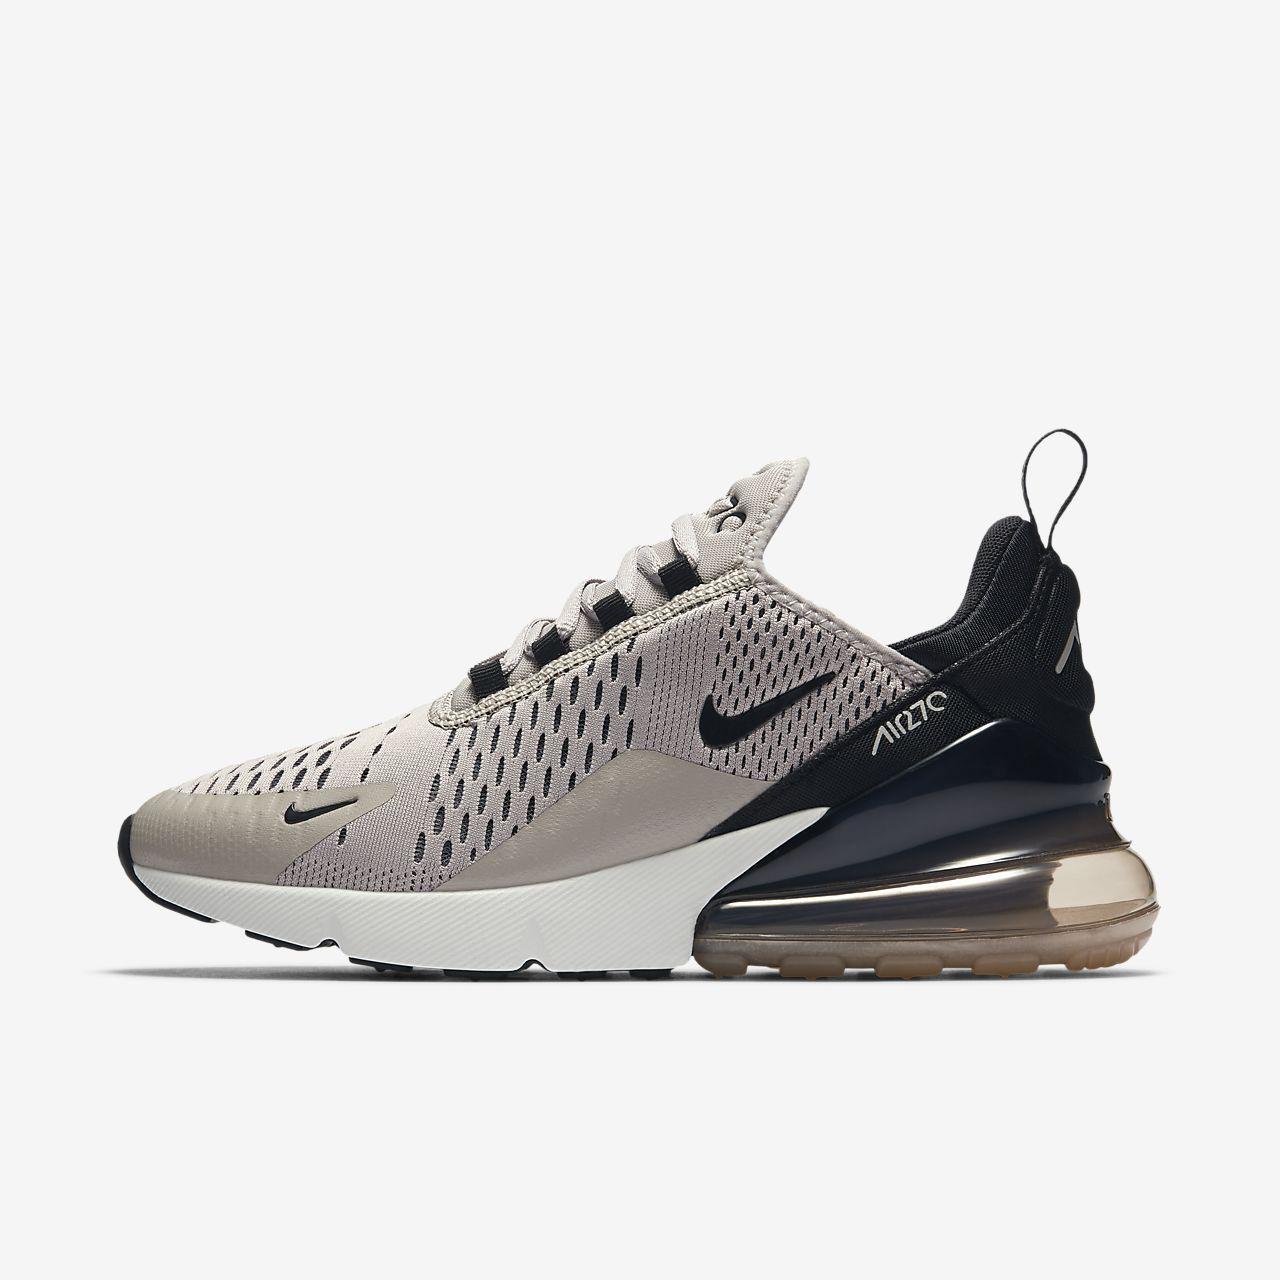 Max 270 Nike Und SportschuheSchuhe Air DamenschuhShoes To Buy XOiuZTlPwk